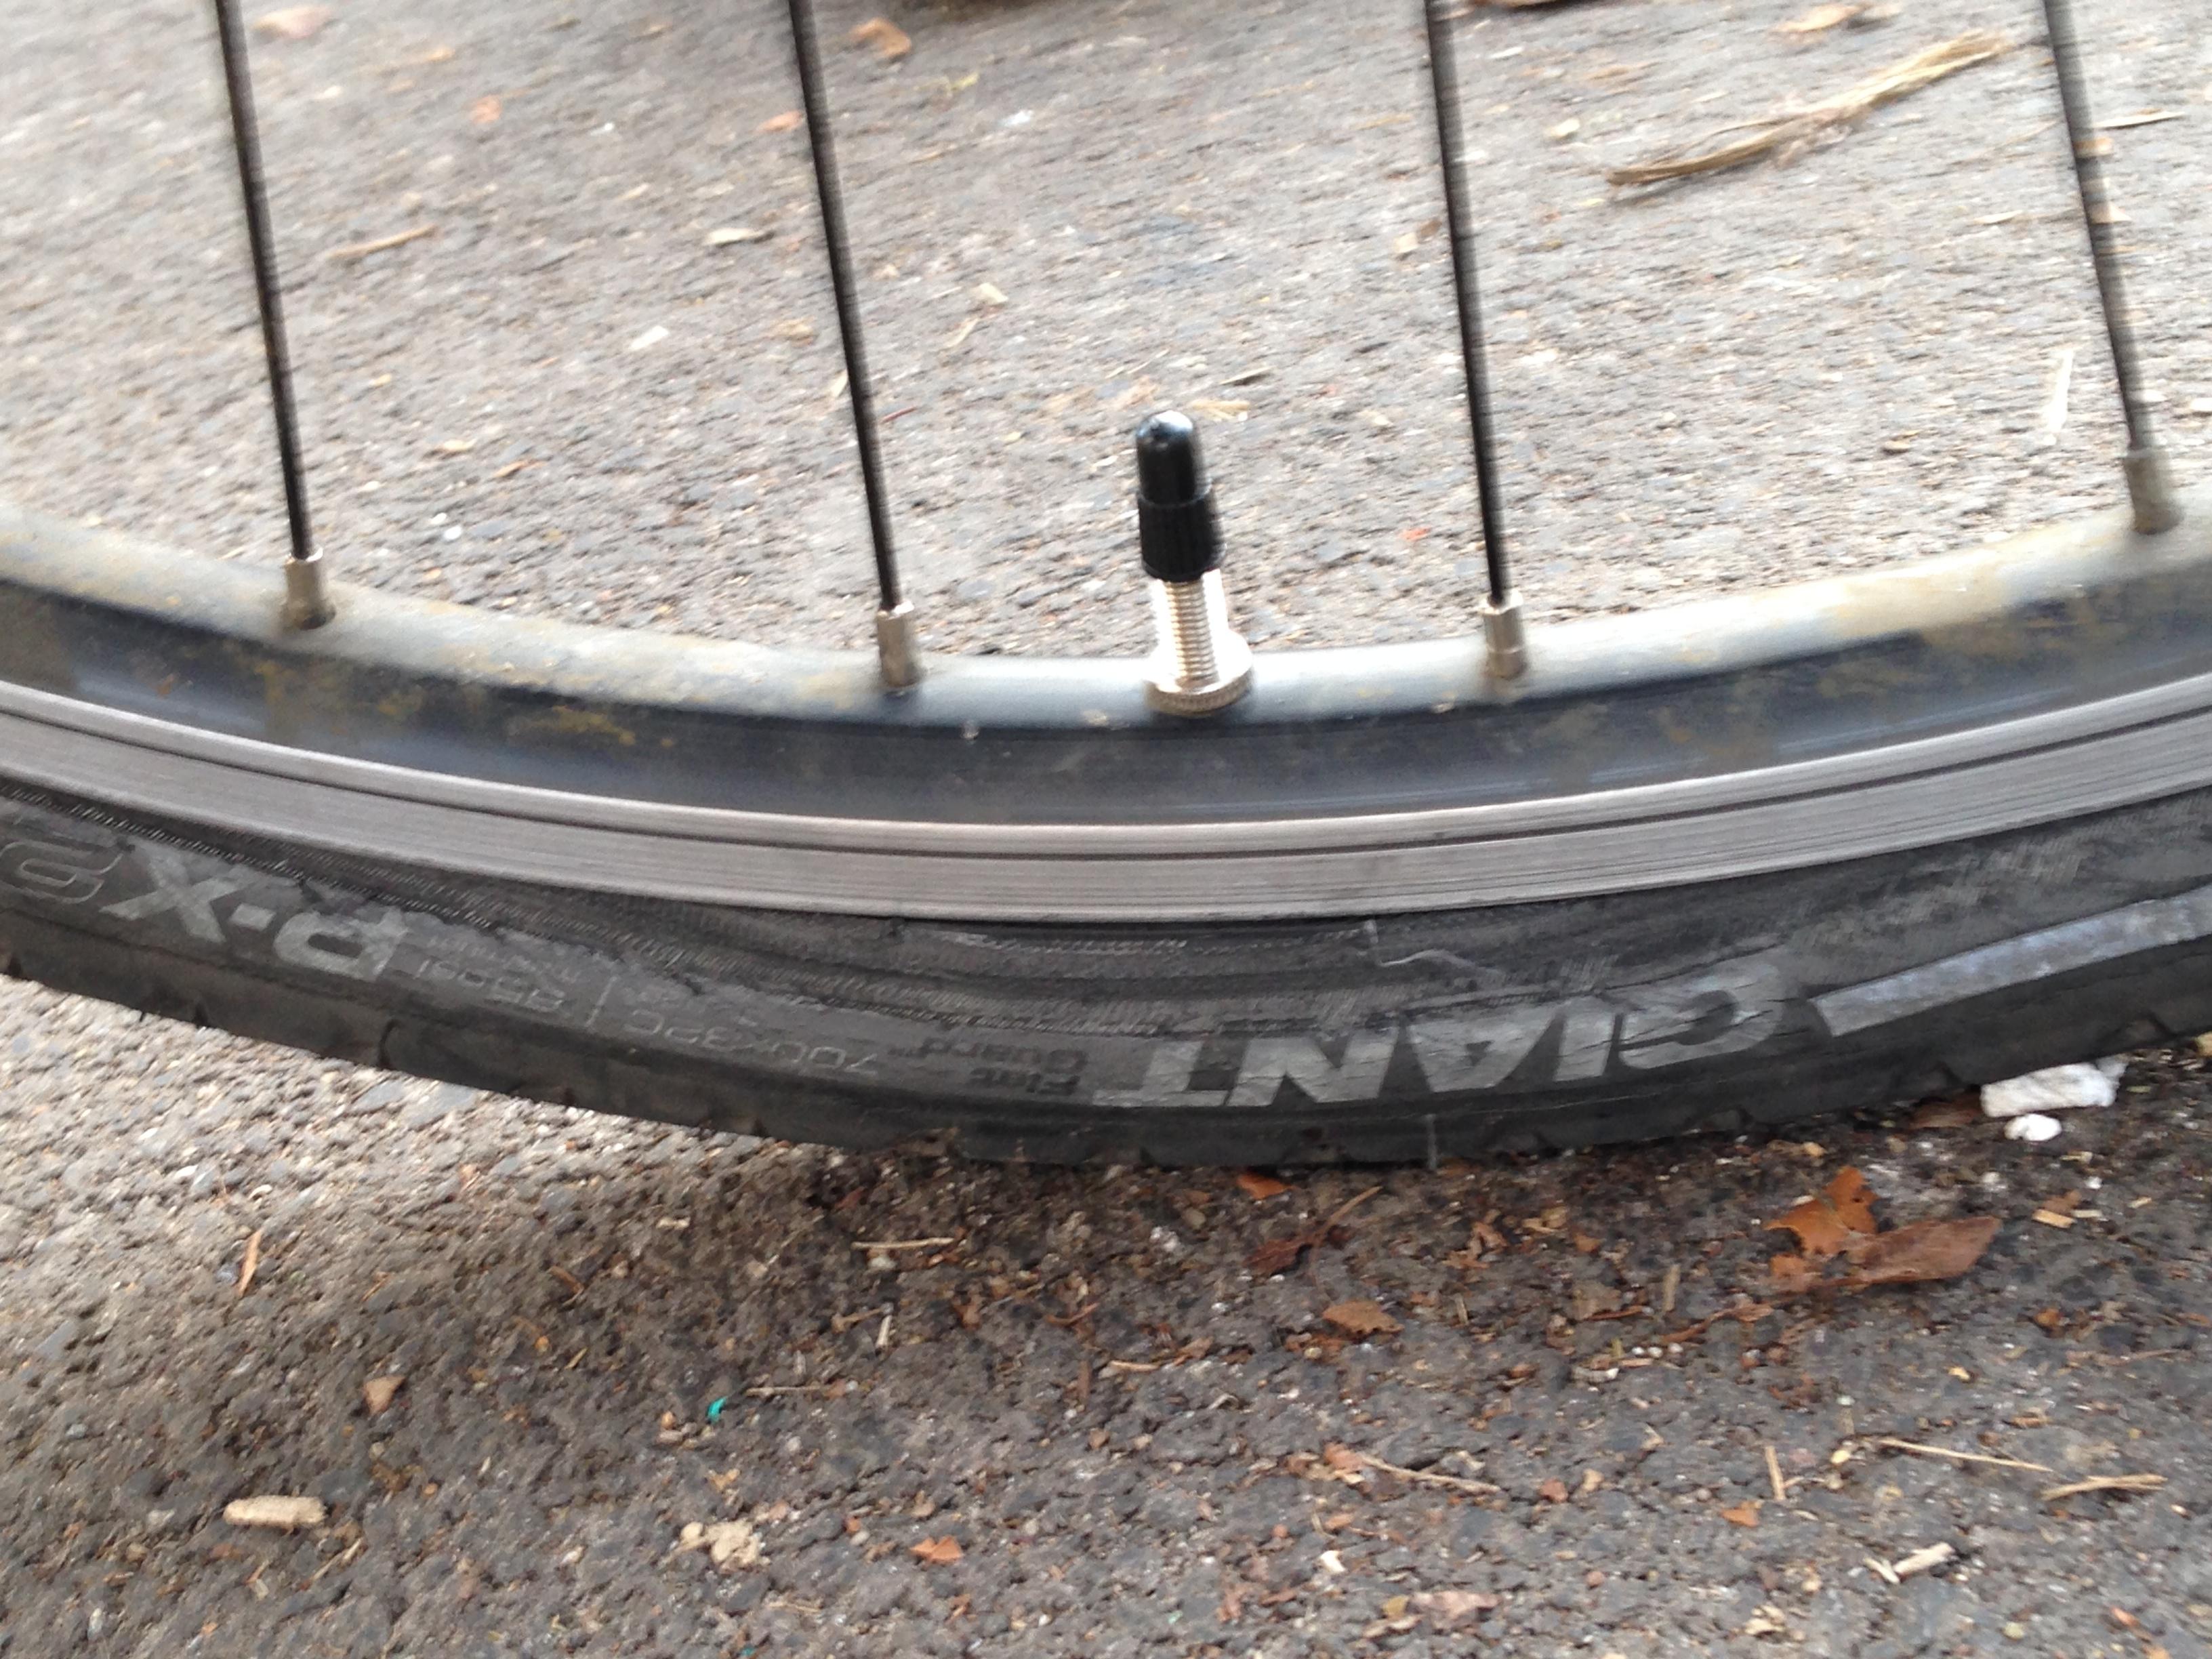 Continuing bike problems